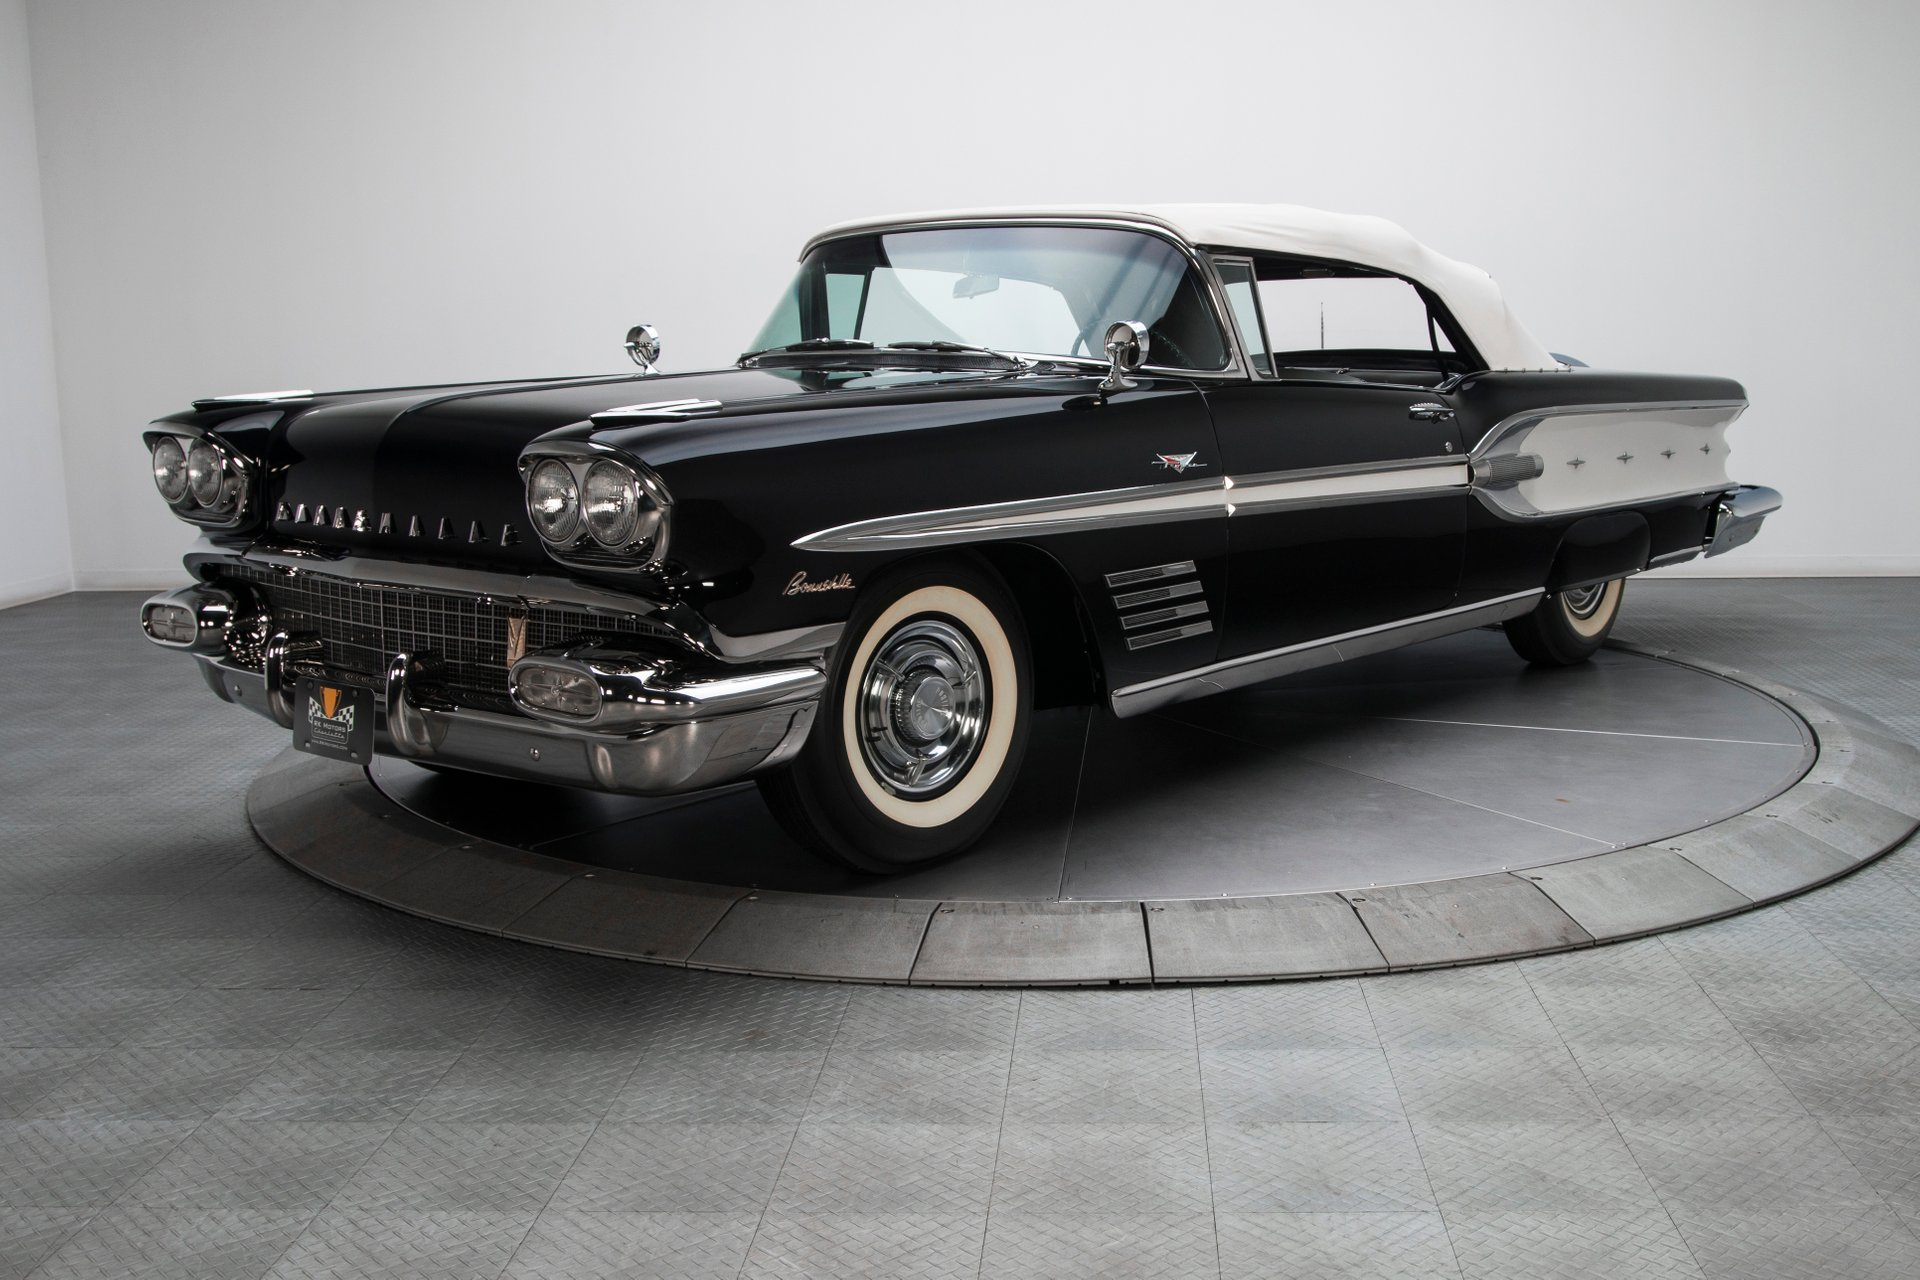 135274 1958 Pontiac Bonneville Rk Motors Classic Cars And Muscle Cars For Sale